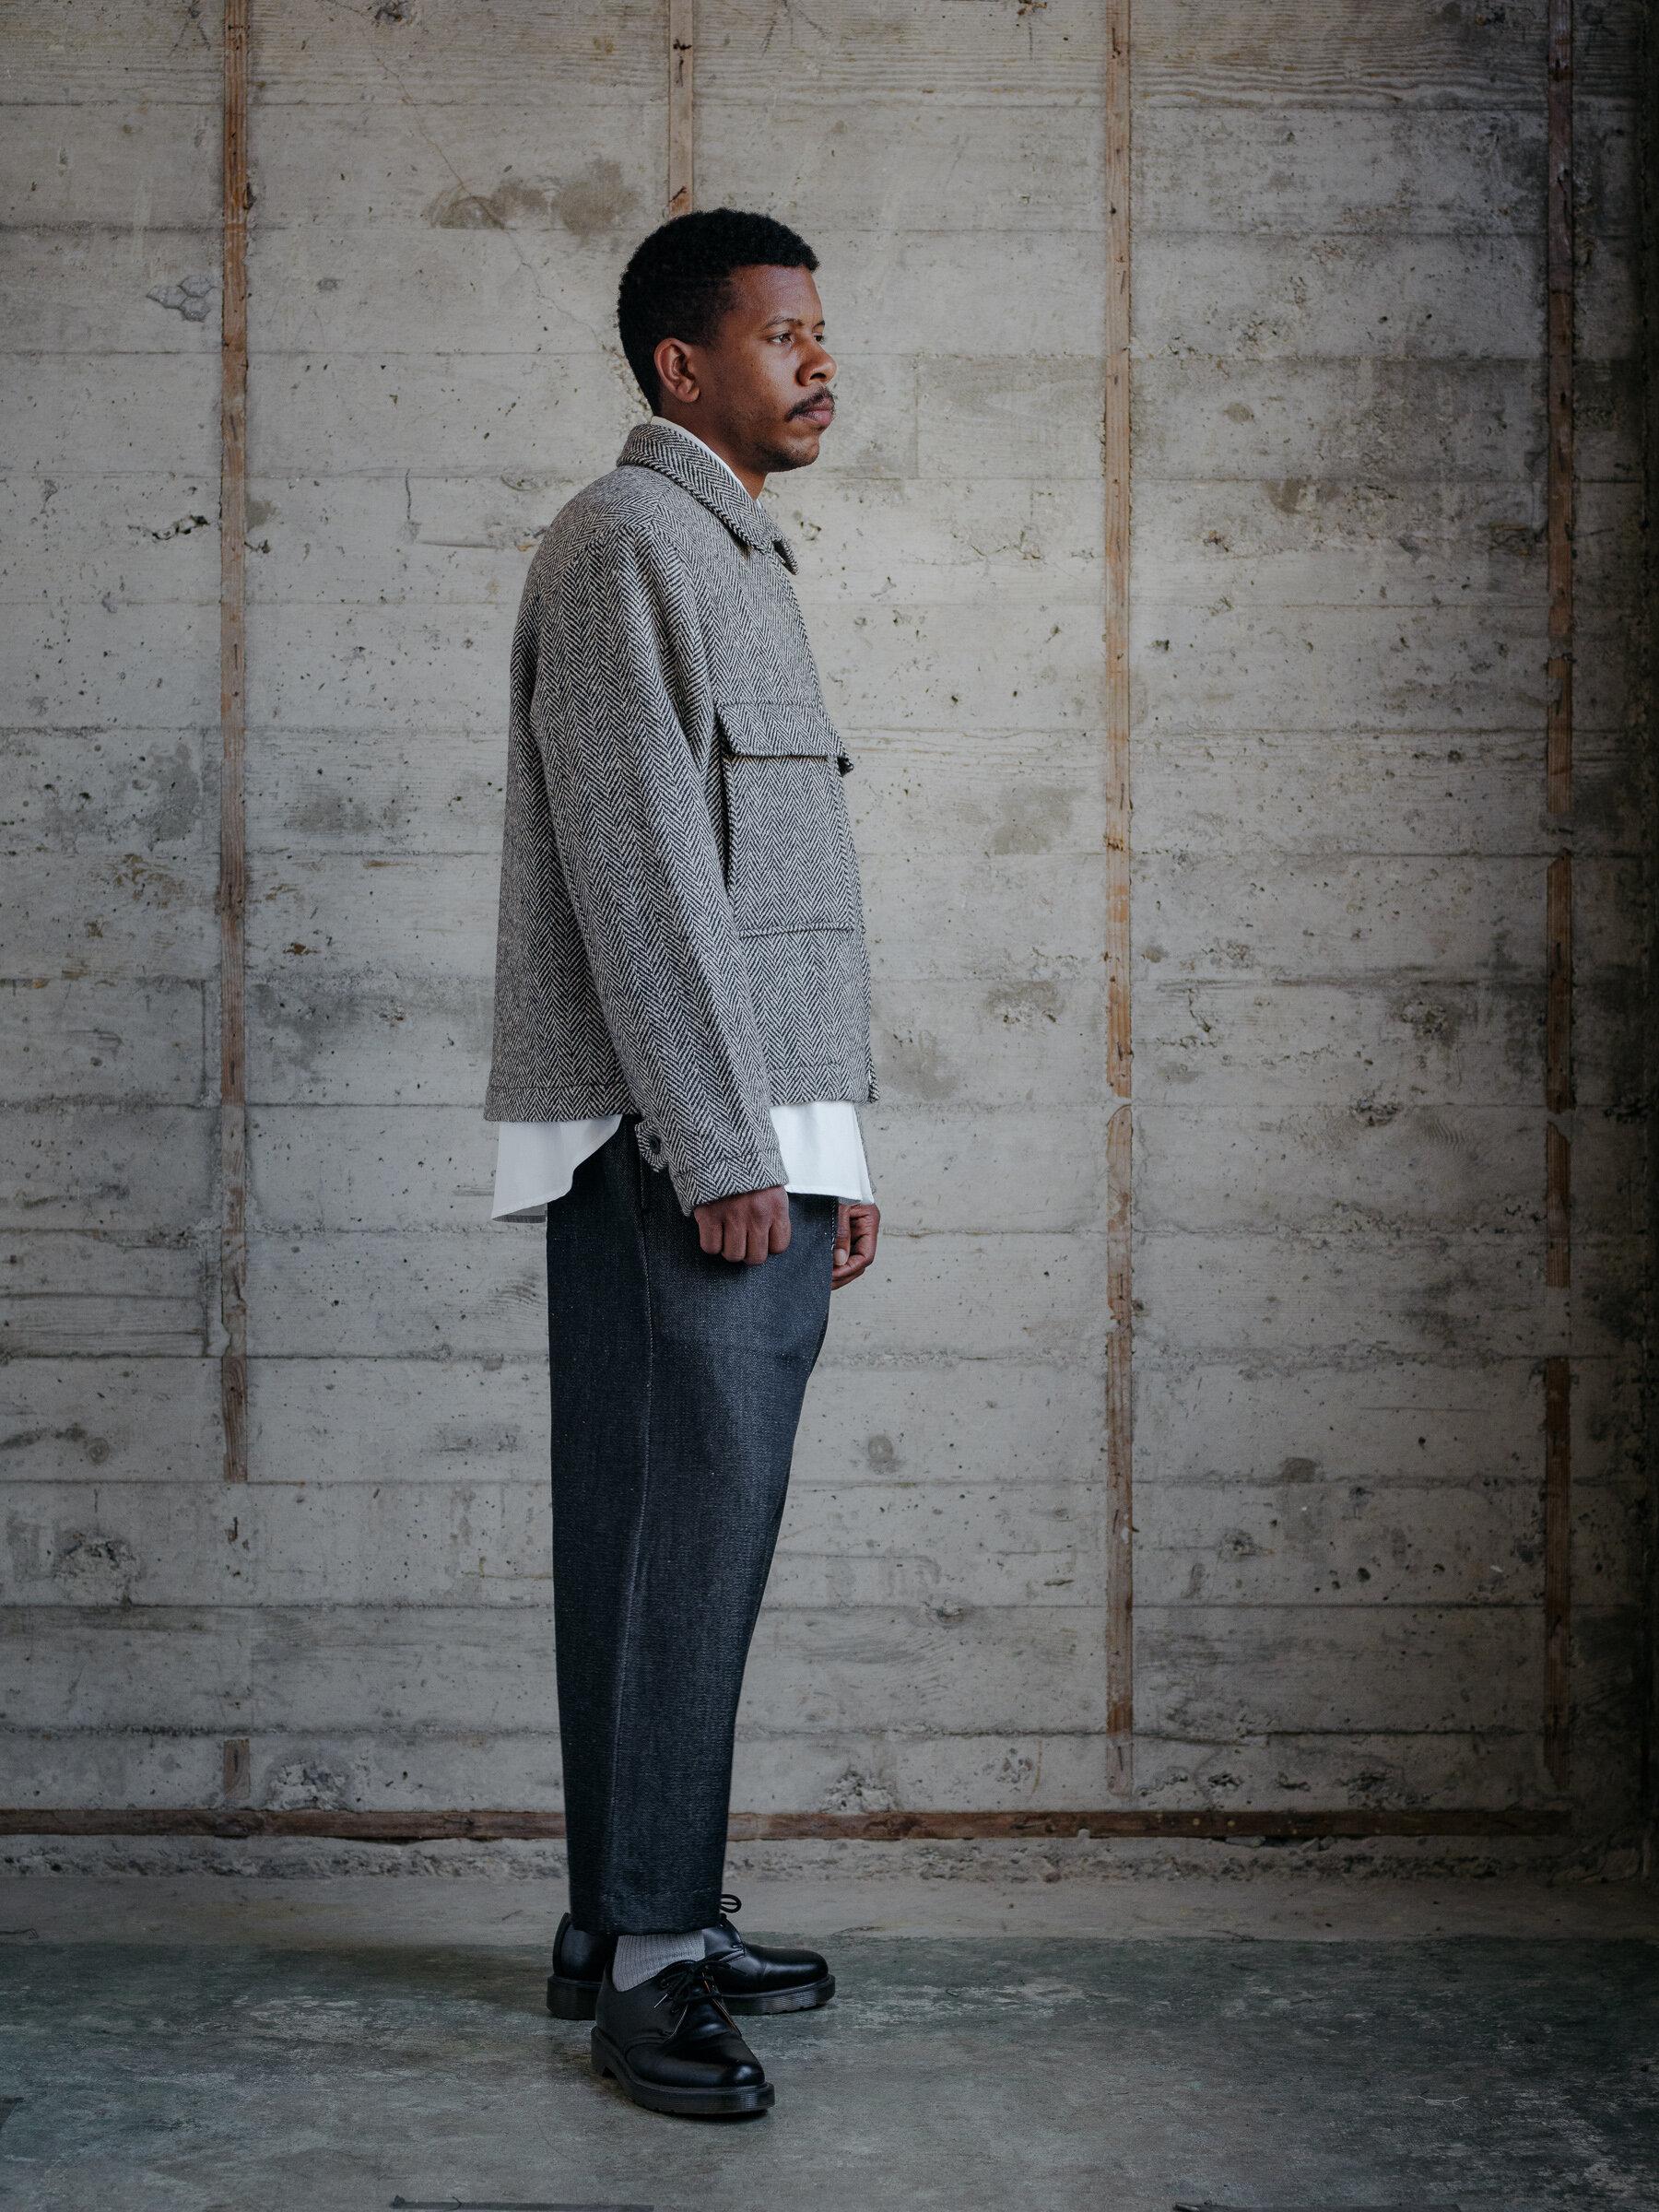 evan-kinori-zip-jacket-lambswool-herringbone-woven-in-ireland-made-in-california-2